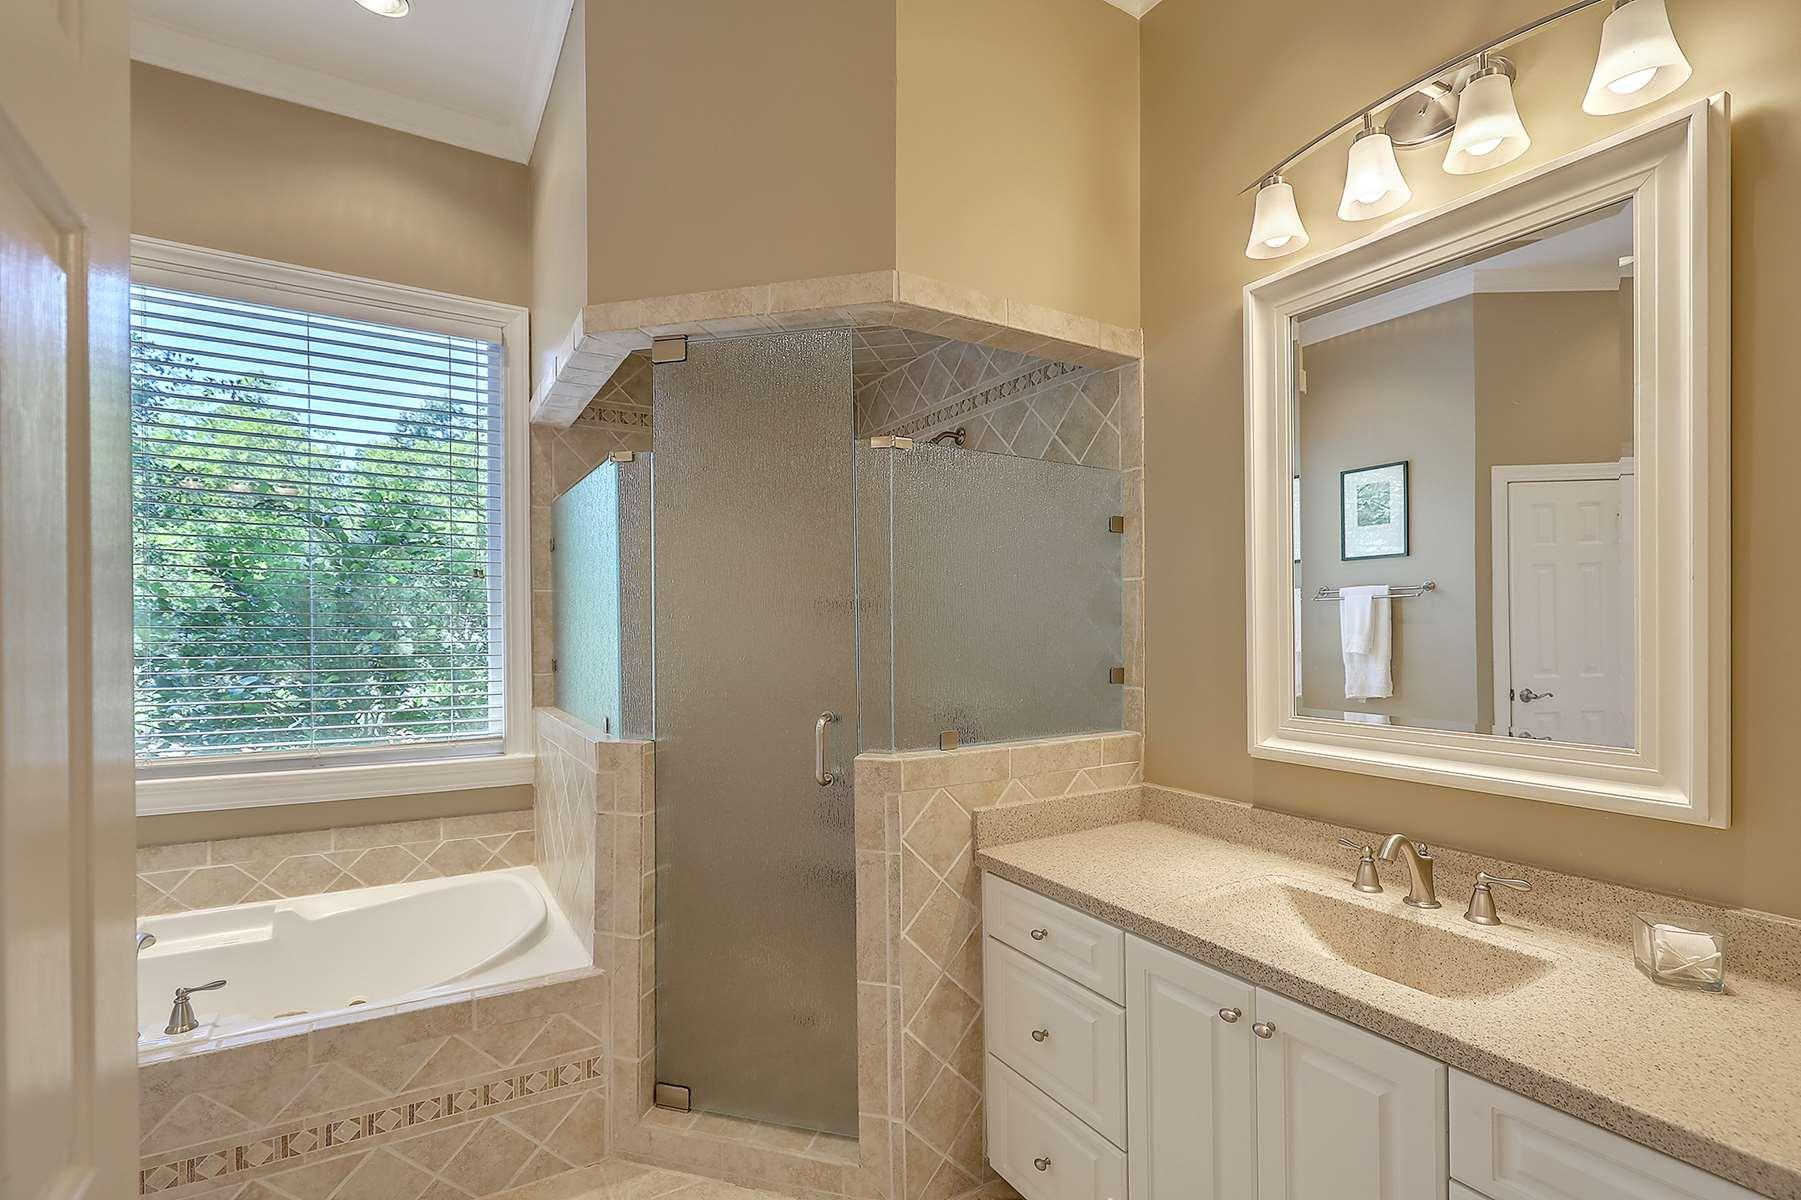 Dunes West Homes For Sale - 2961 Pignatelli, Mount Pleasant, SC - 14